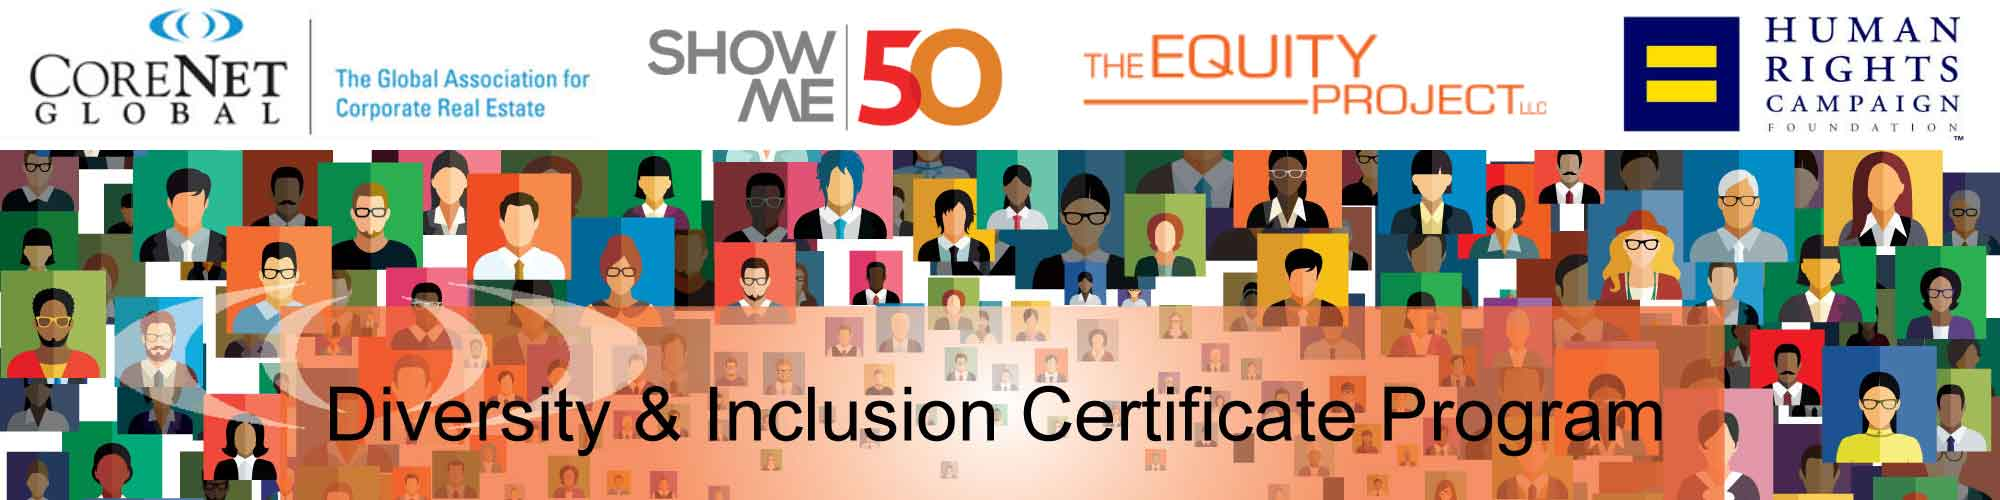 CoreNet Global Diversity & Inclusion Certificate Program